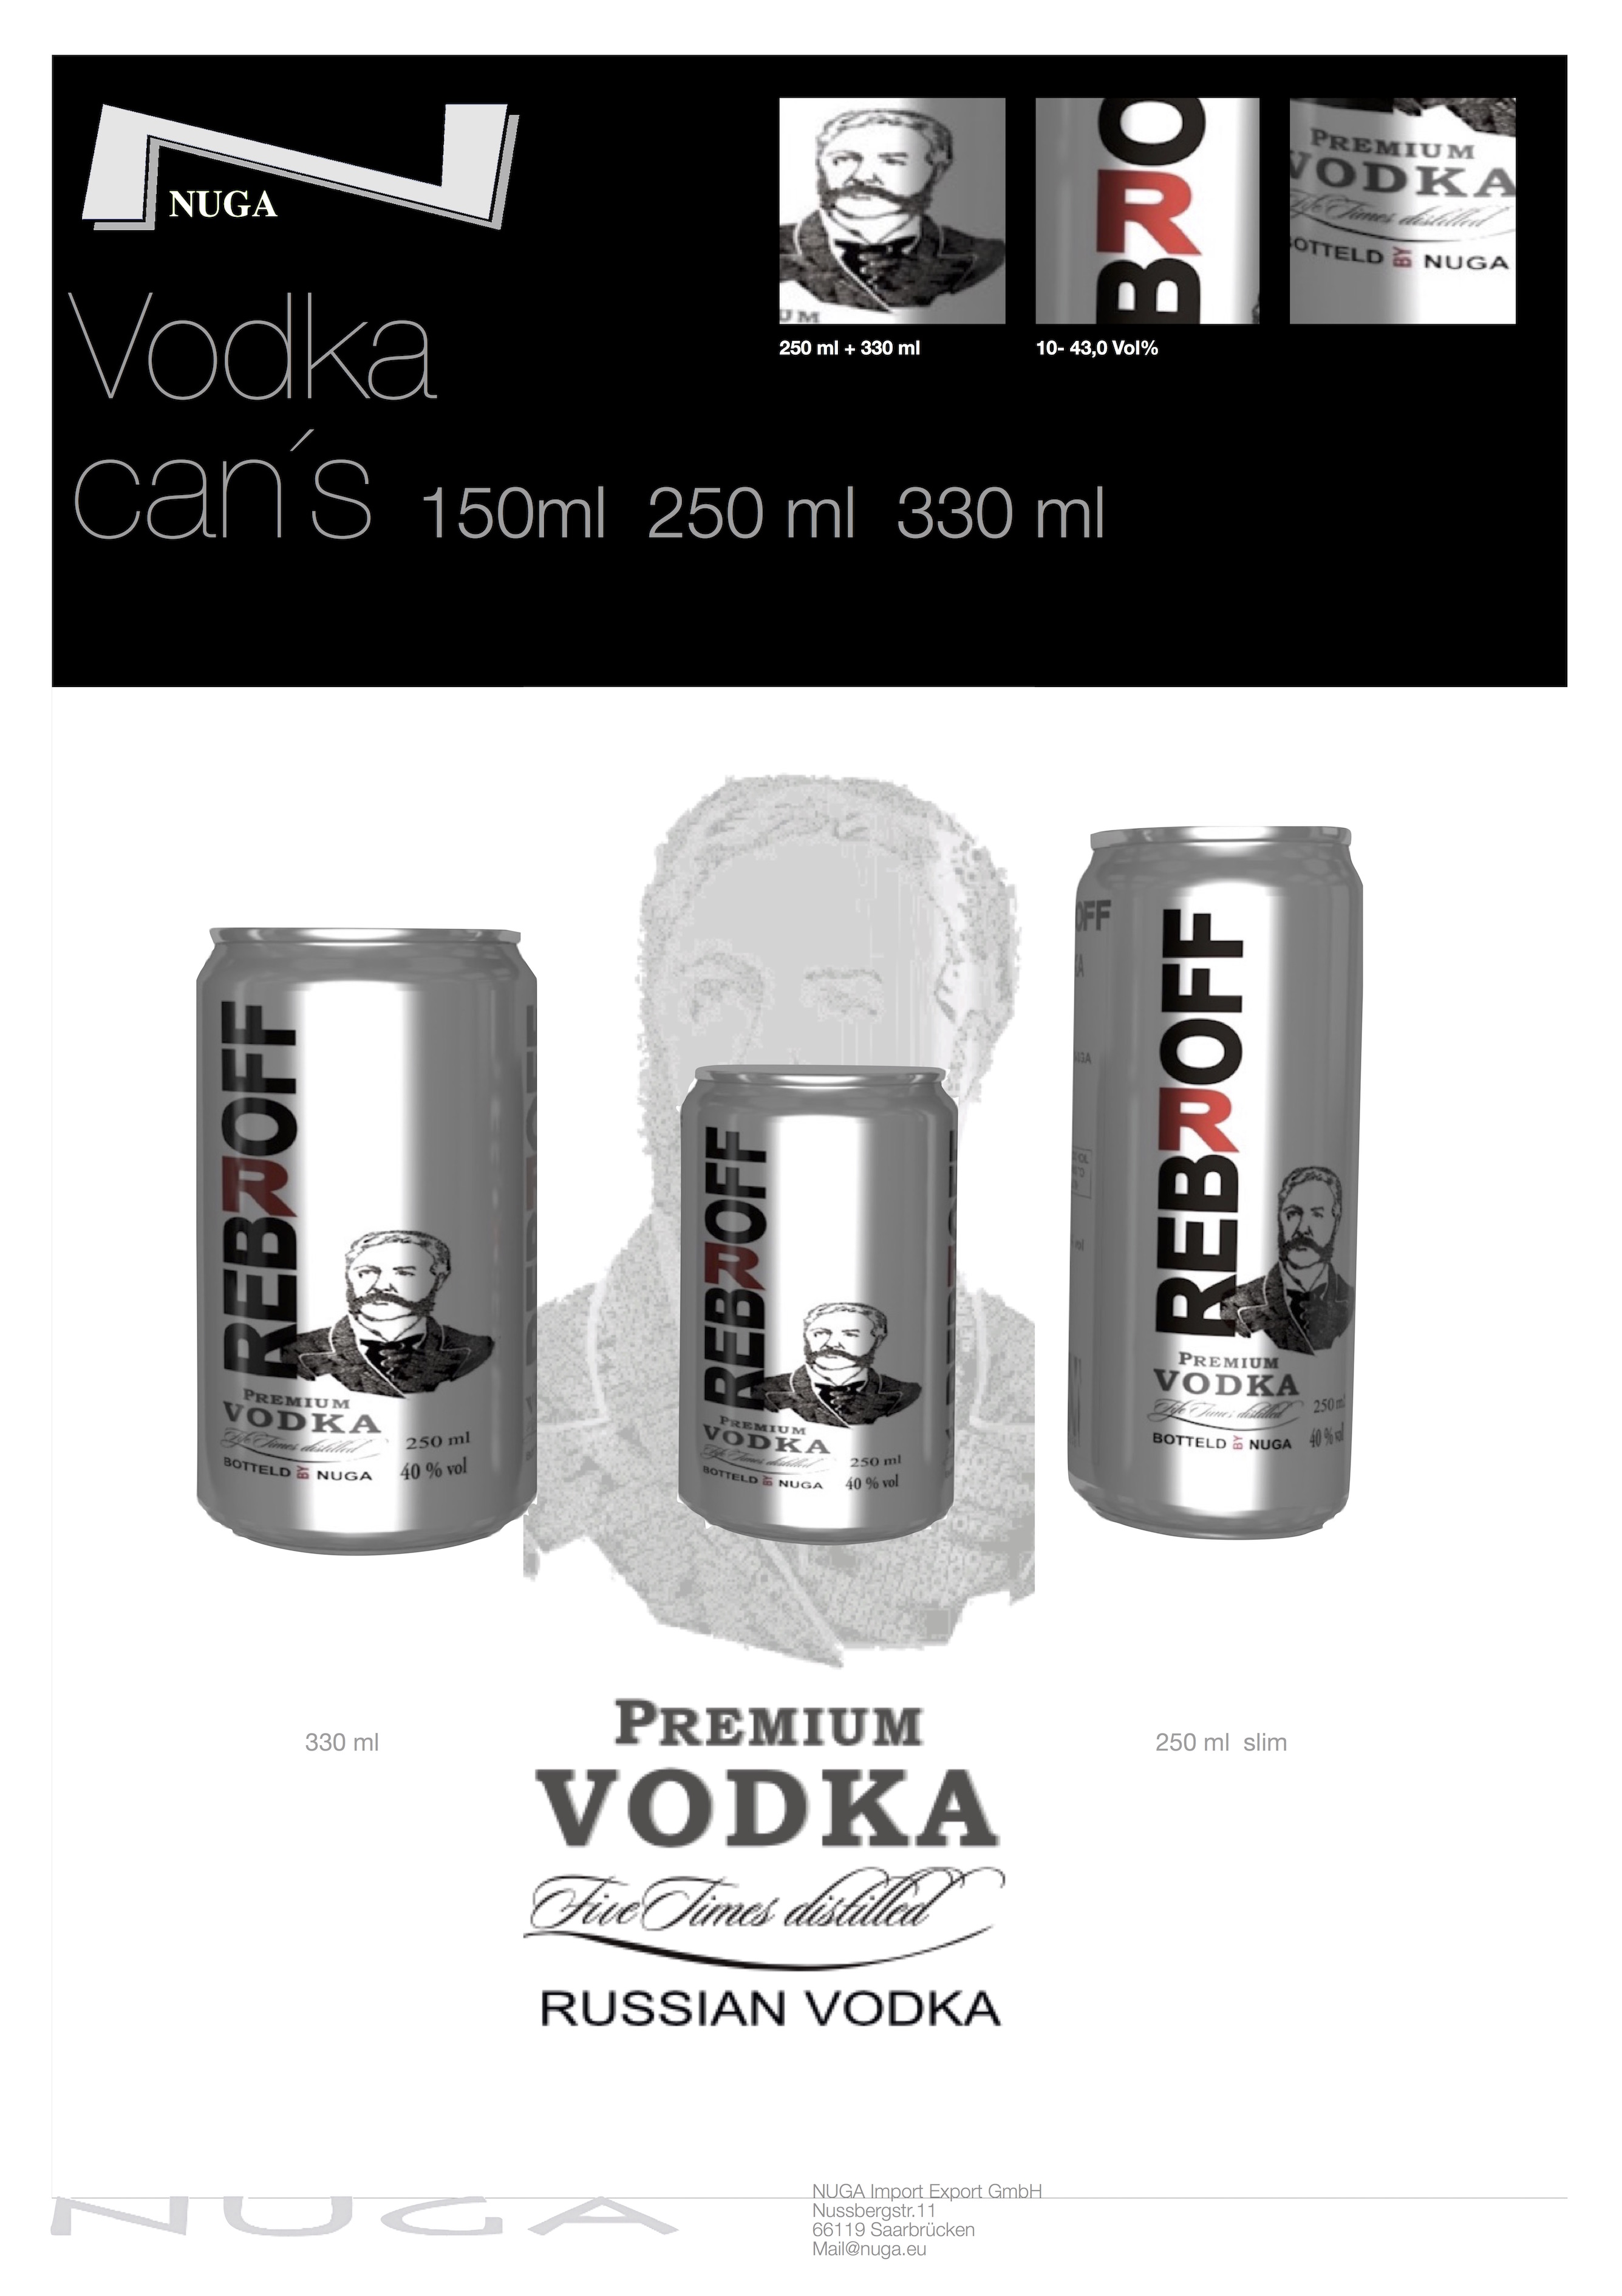 Vodka Rebroff Russian Vodka- Russian Premium Vodka in cans